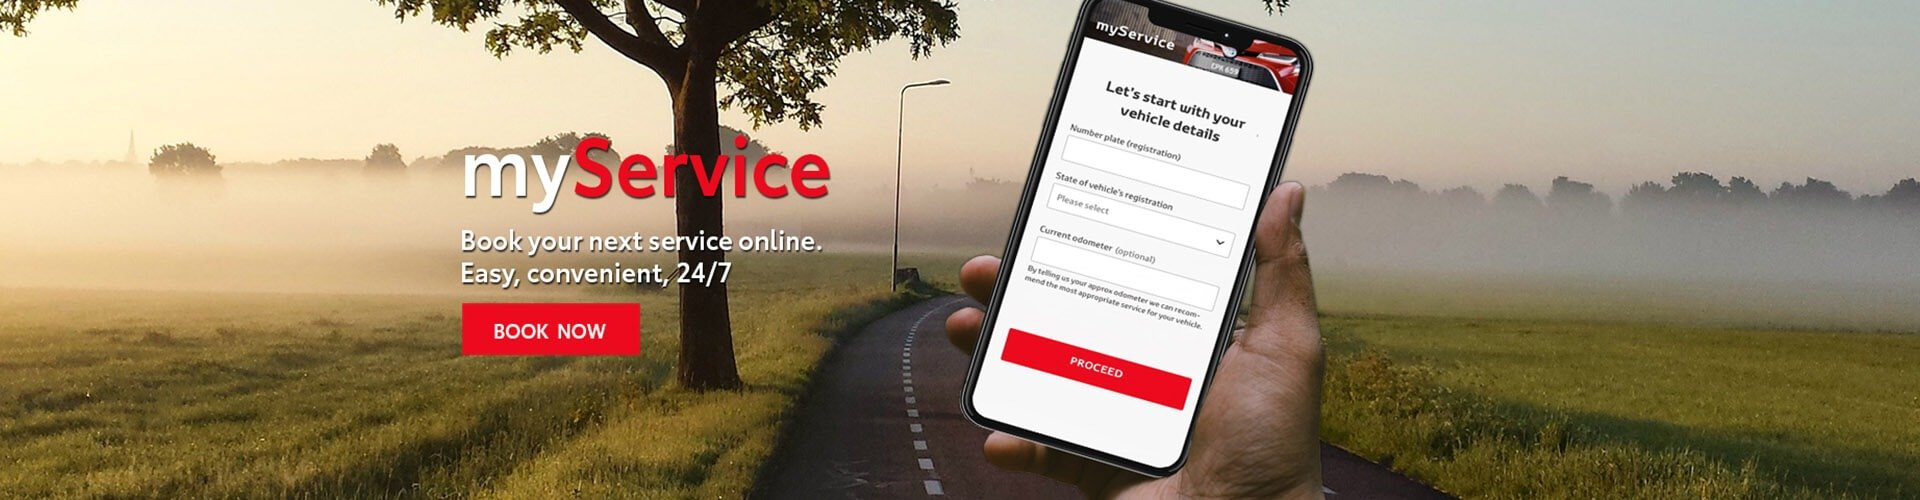 myService Online Service Booking - easy, convenient, 24/7